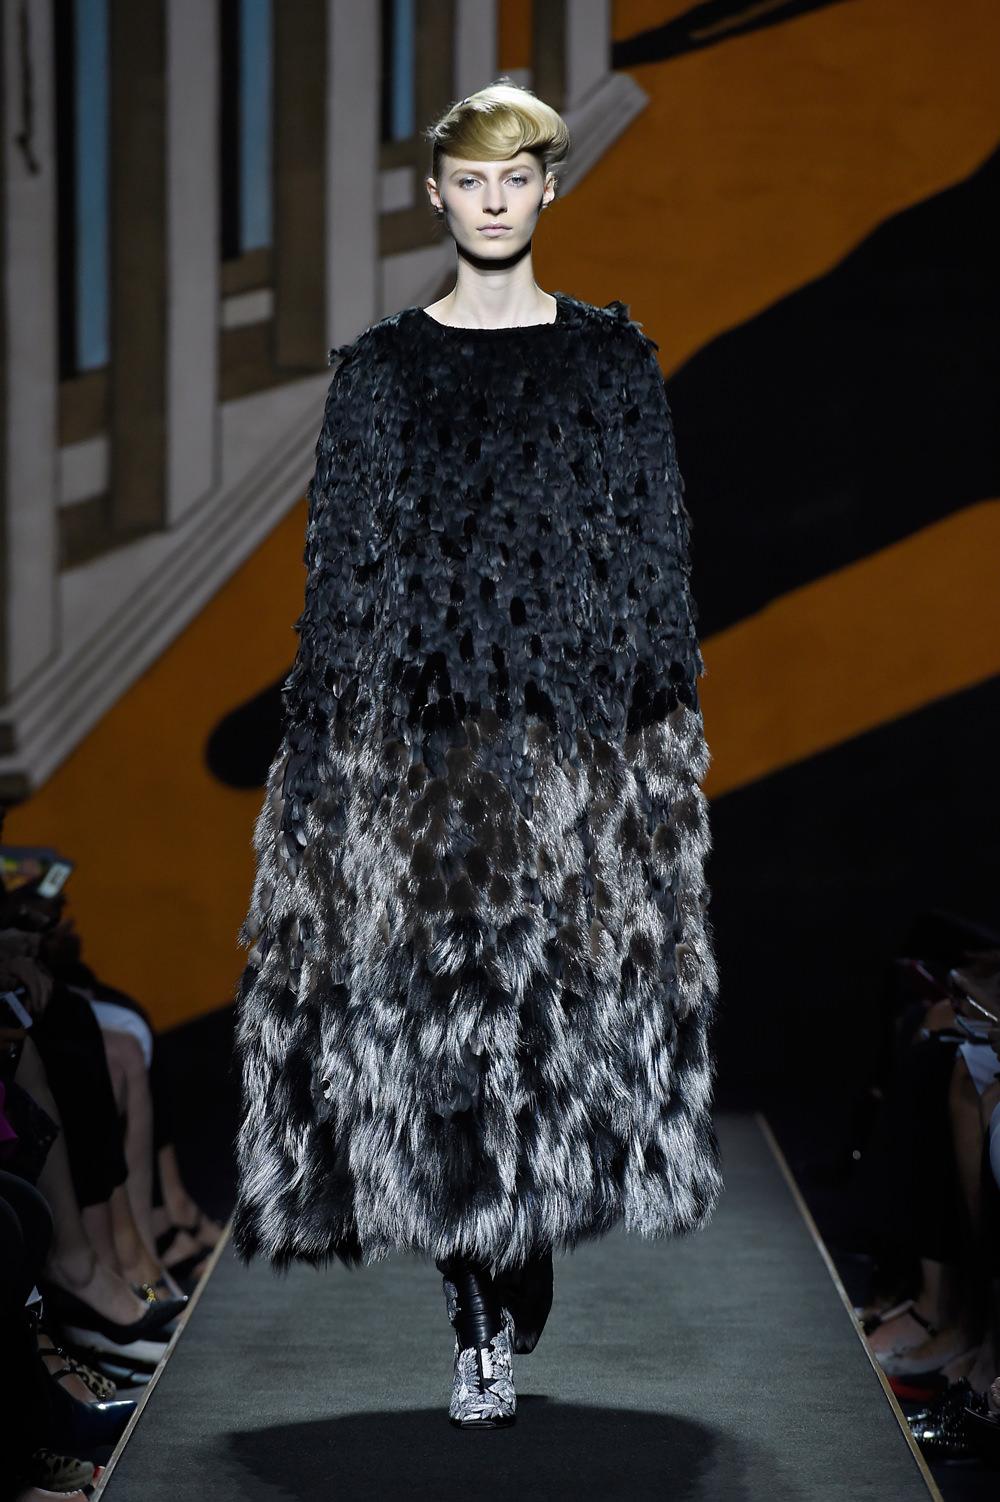 Karl Lagerfeld presents Fendi's first Parisian runway show